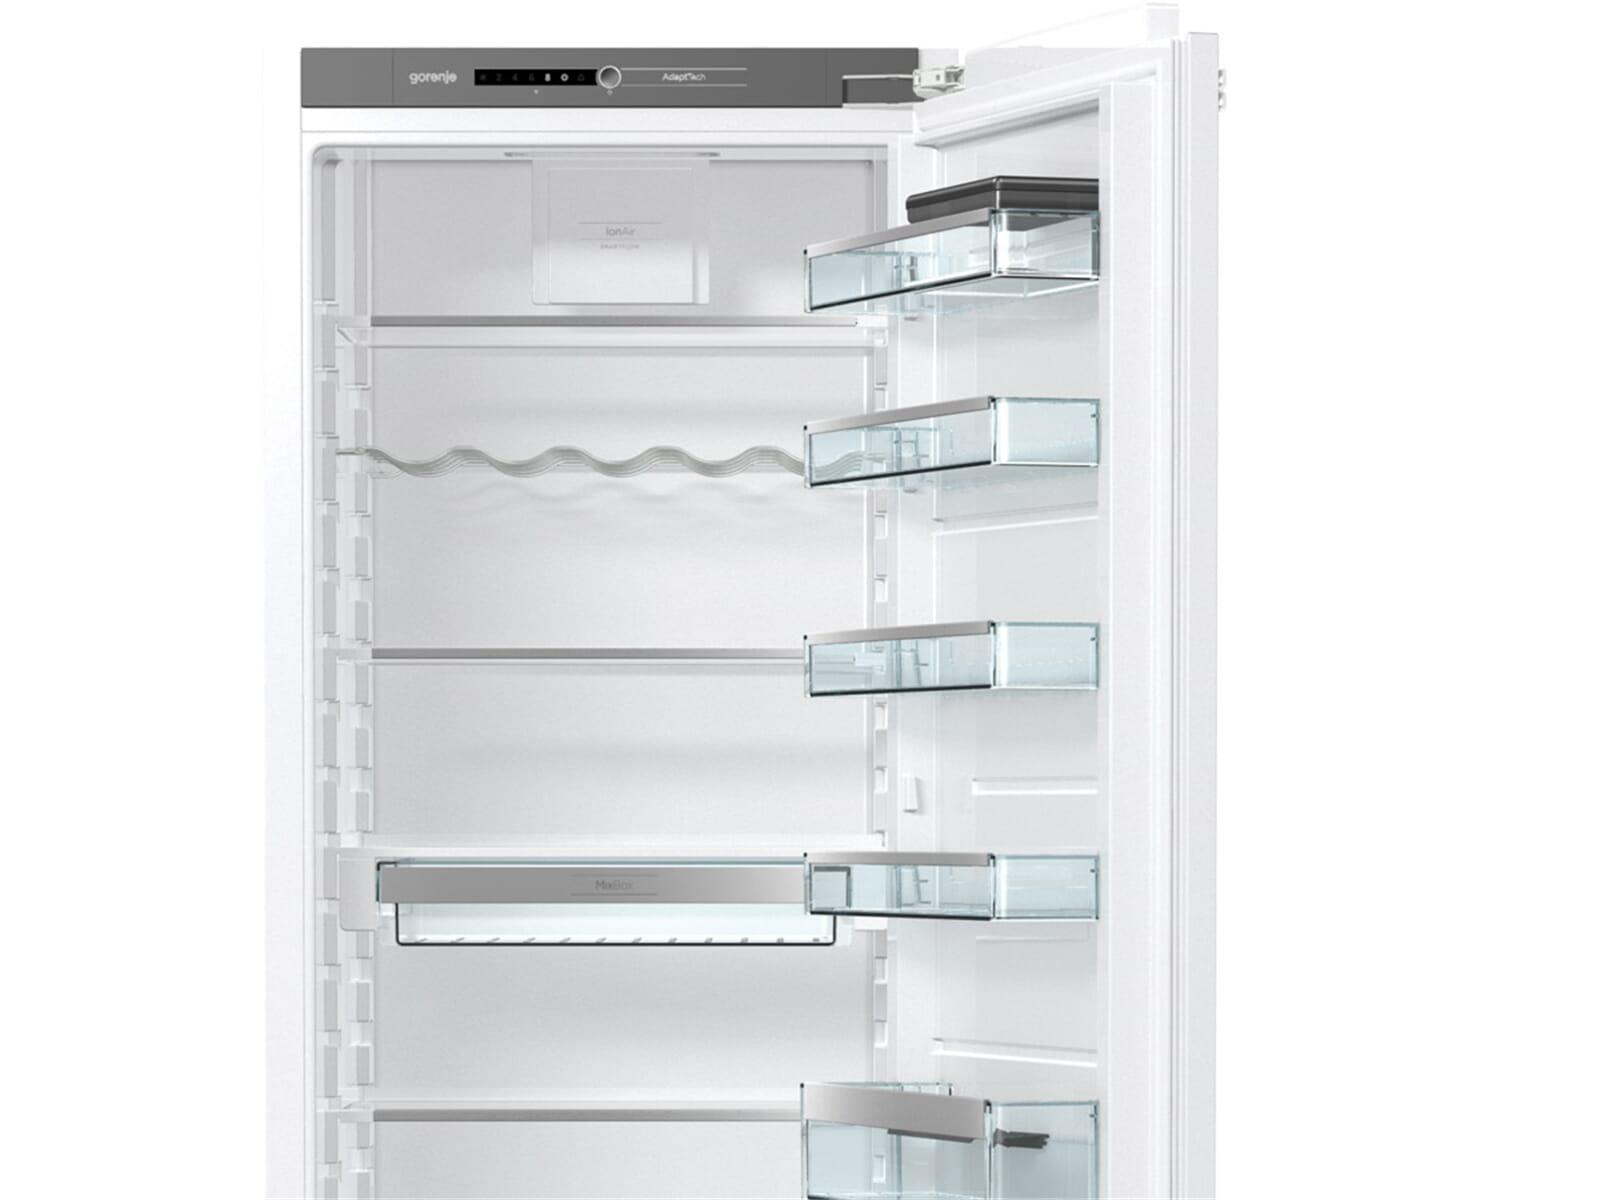 Gorenje Kühlschrank Einbau : Gorenje ri a einbaukühlschrank